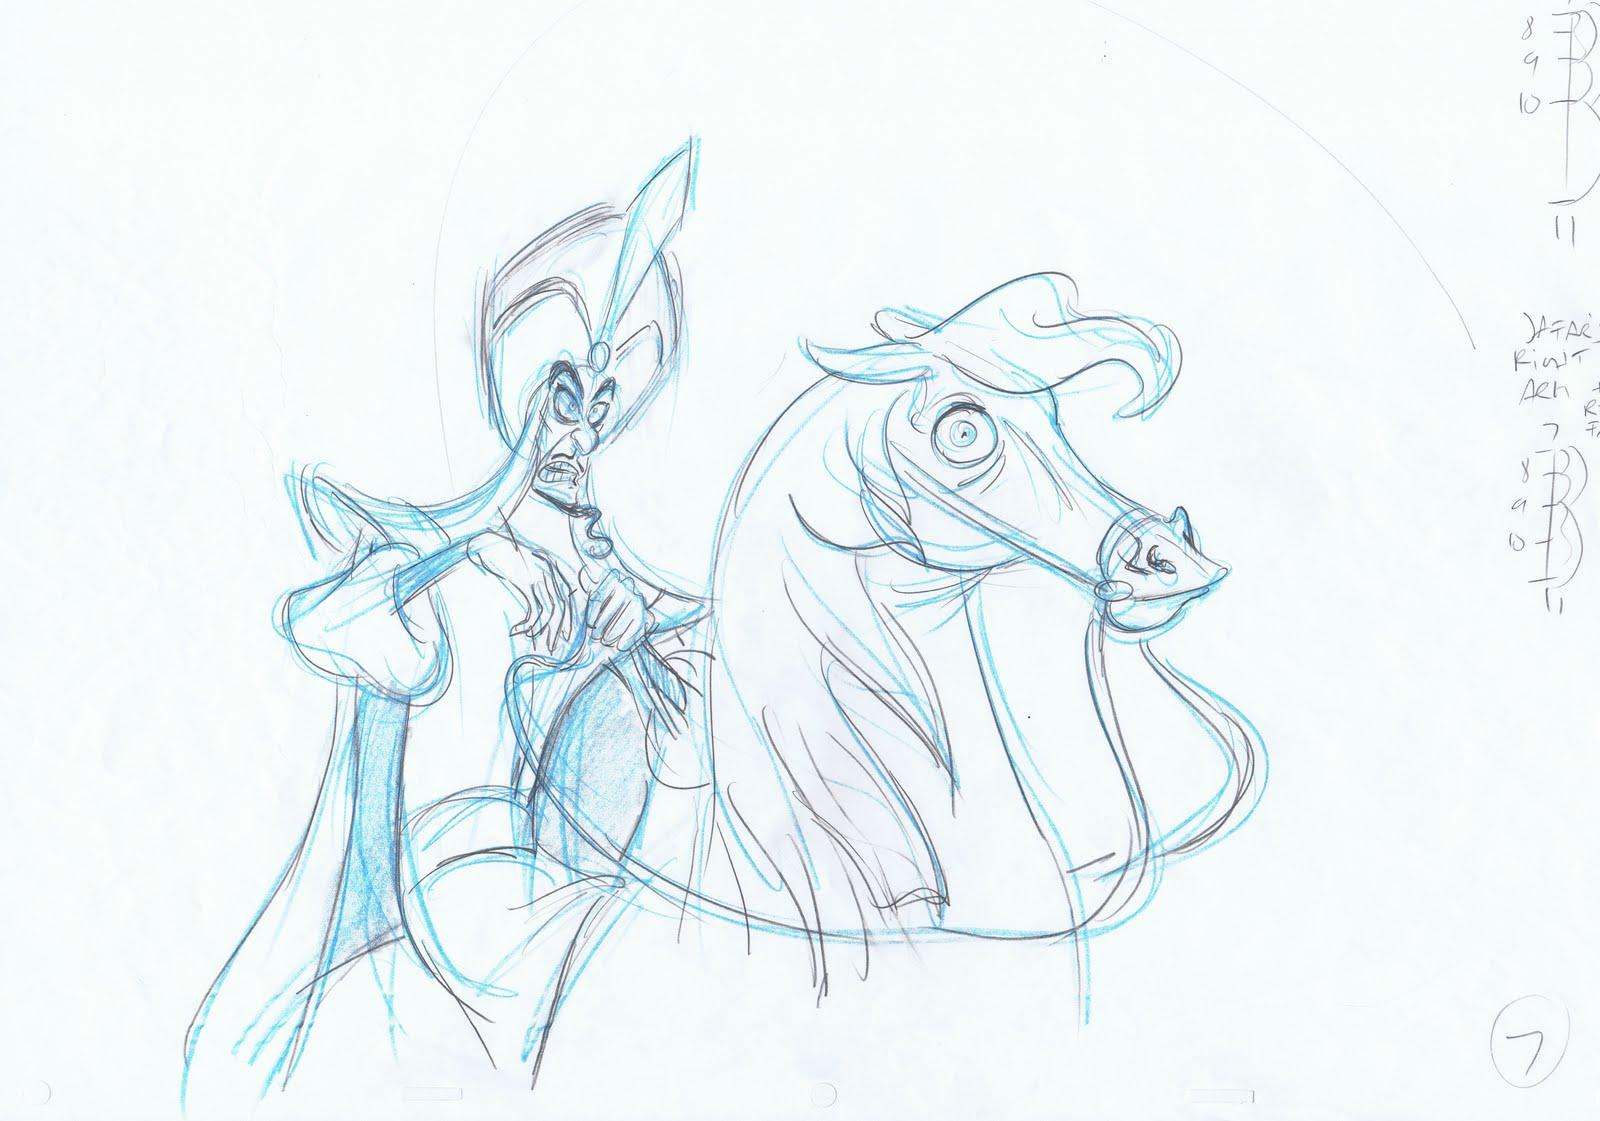 aladdin_production_drawing_andreas_deja_3.jpg